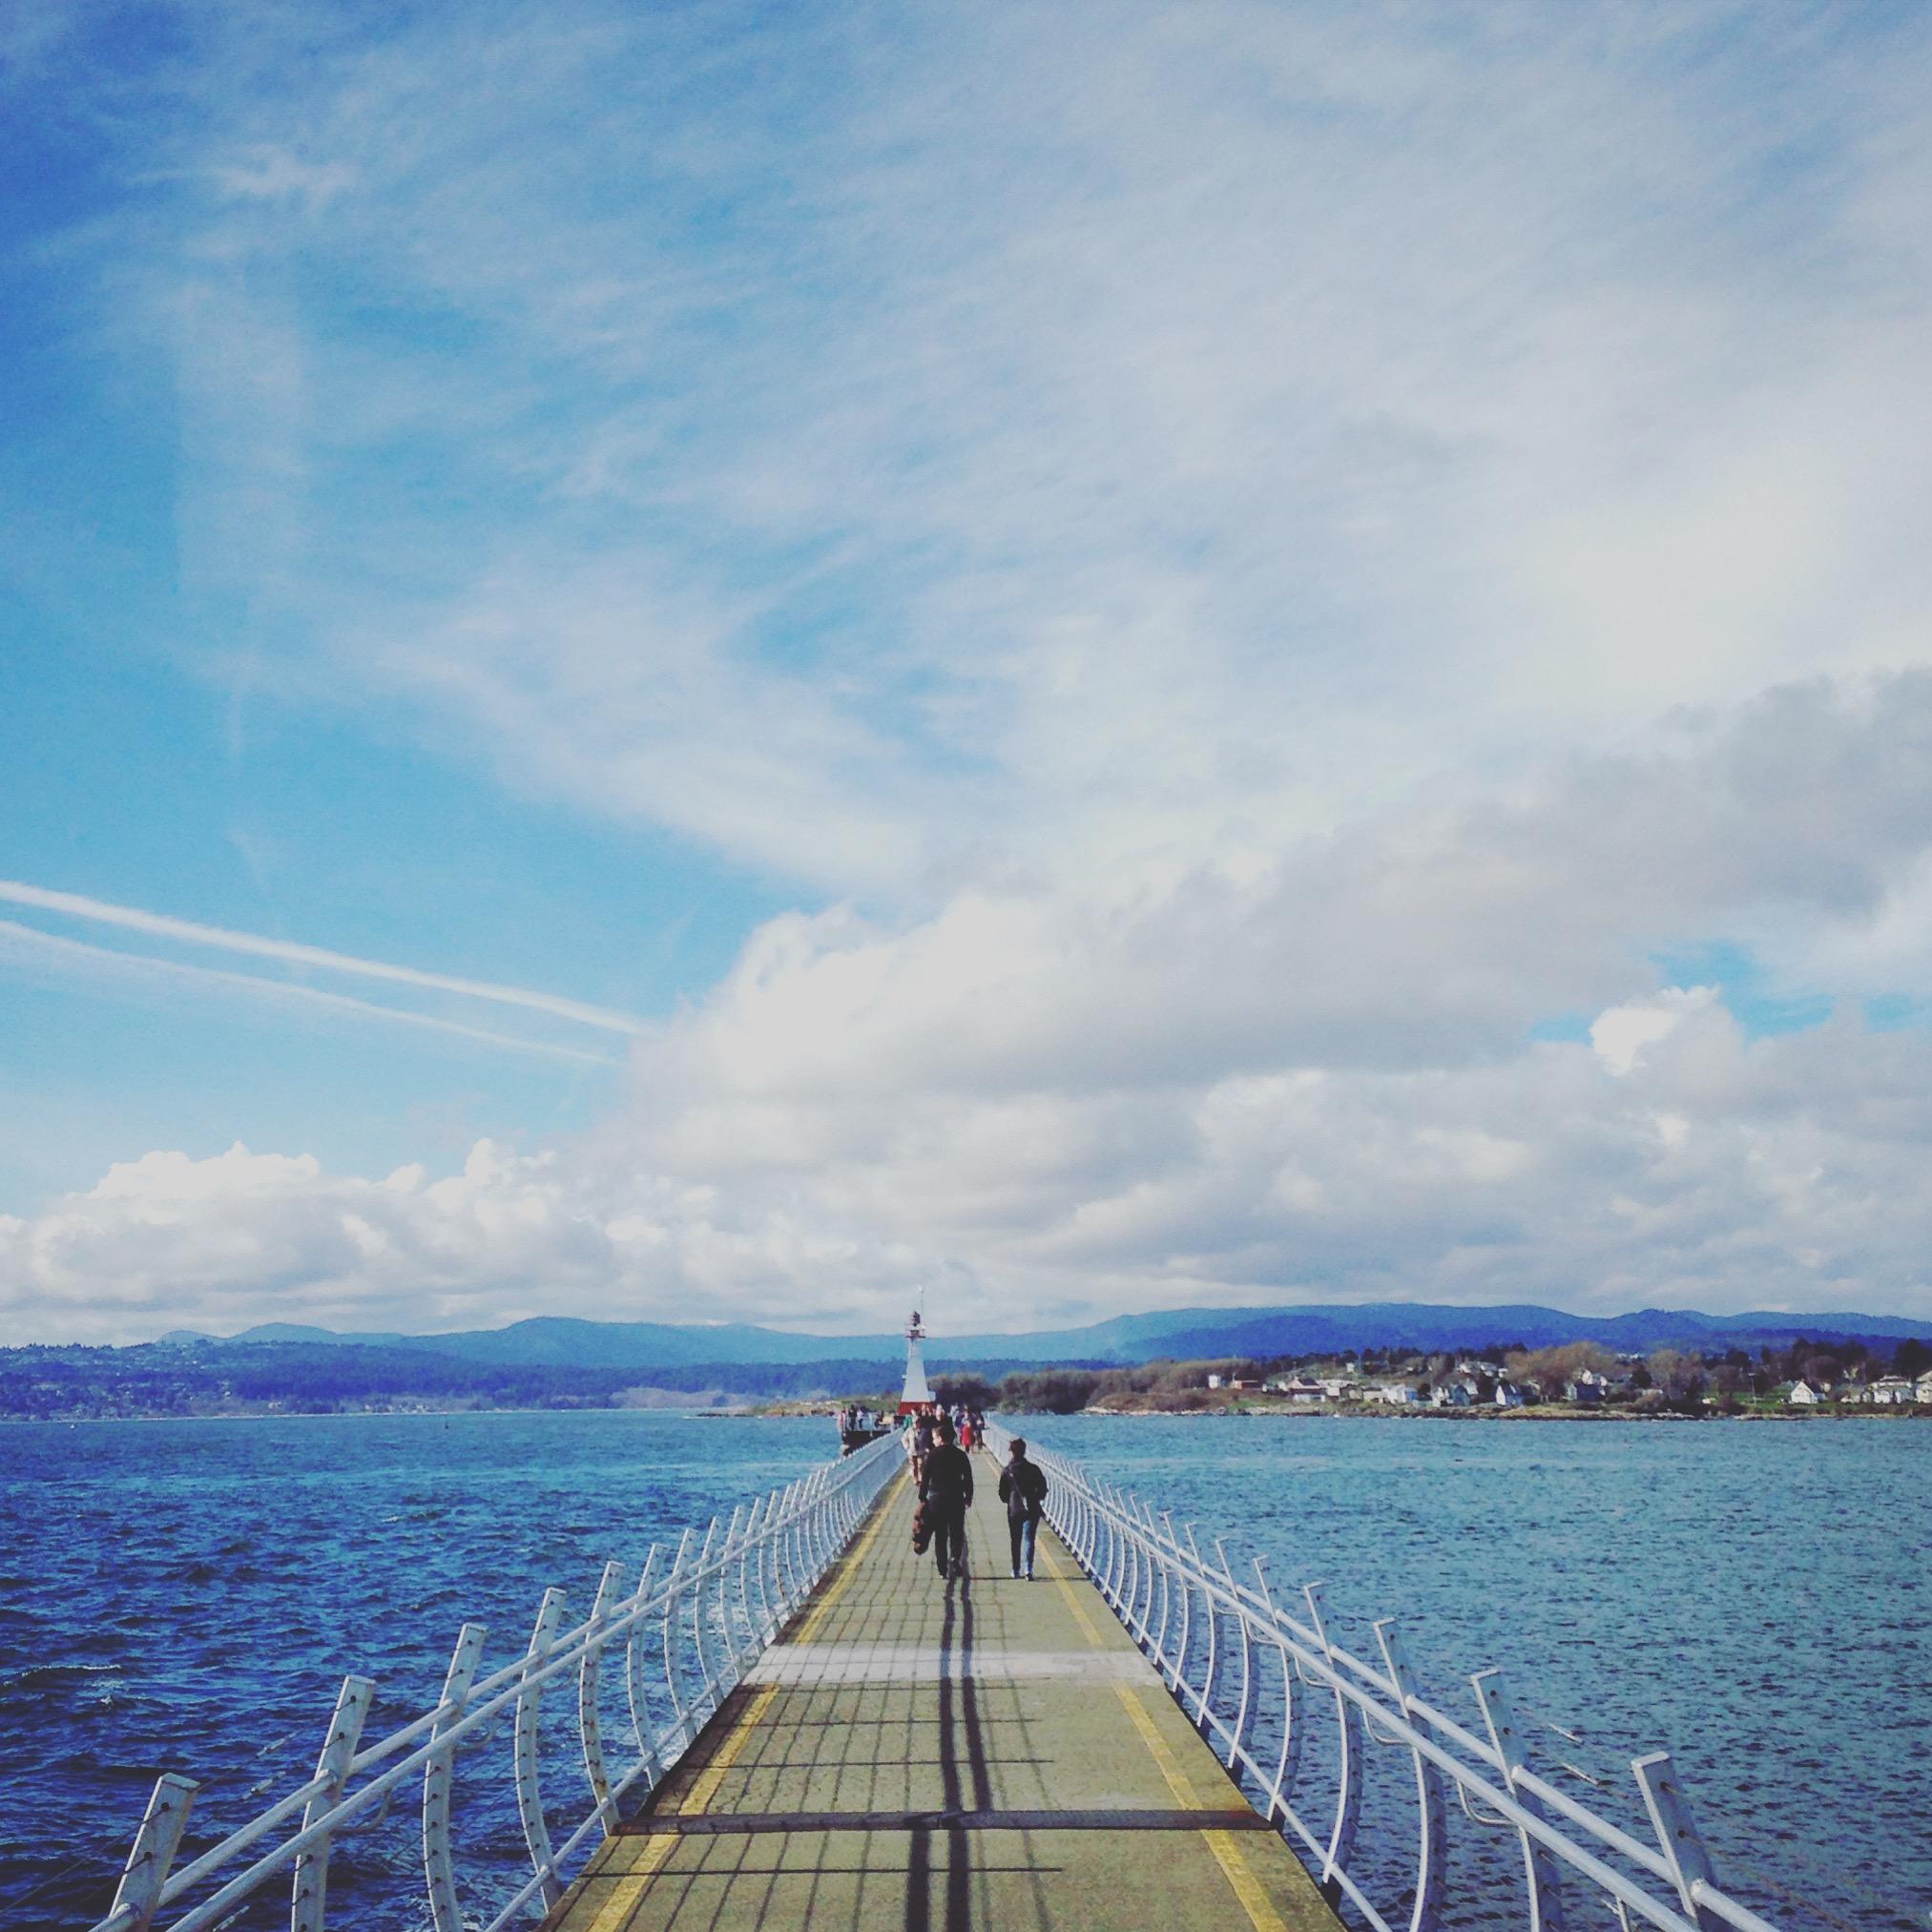 Breakwater Pier, Victoria, British Columbia